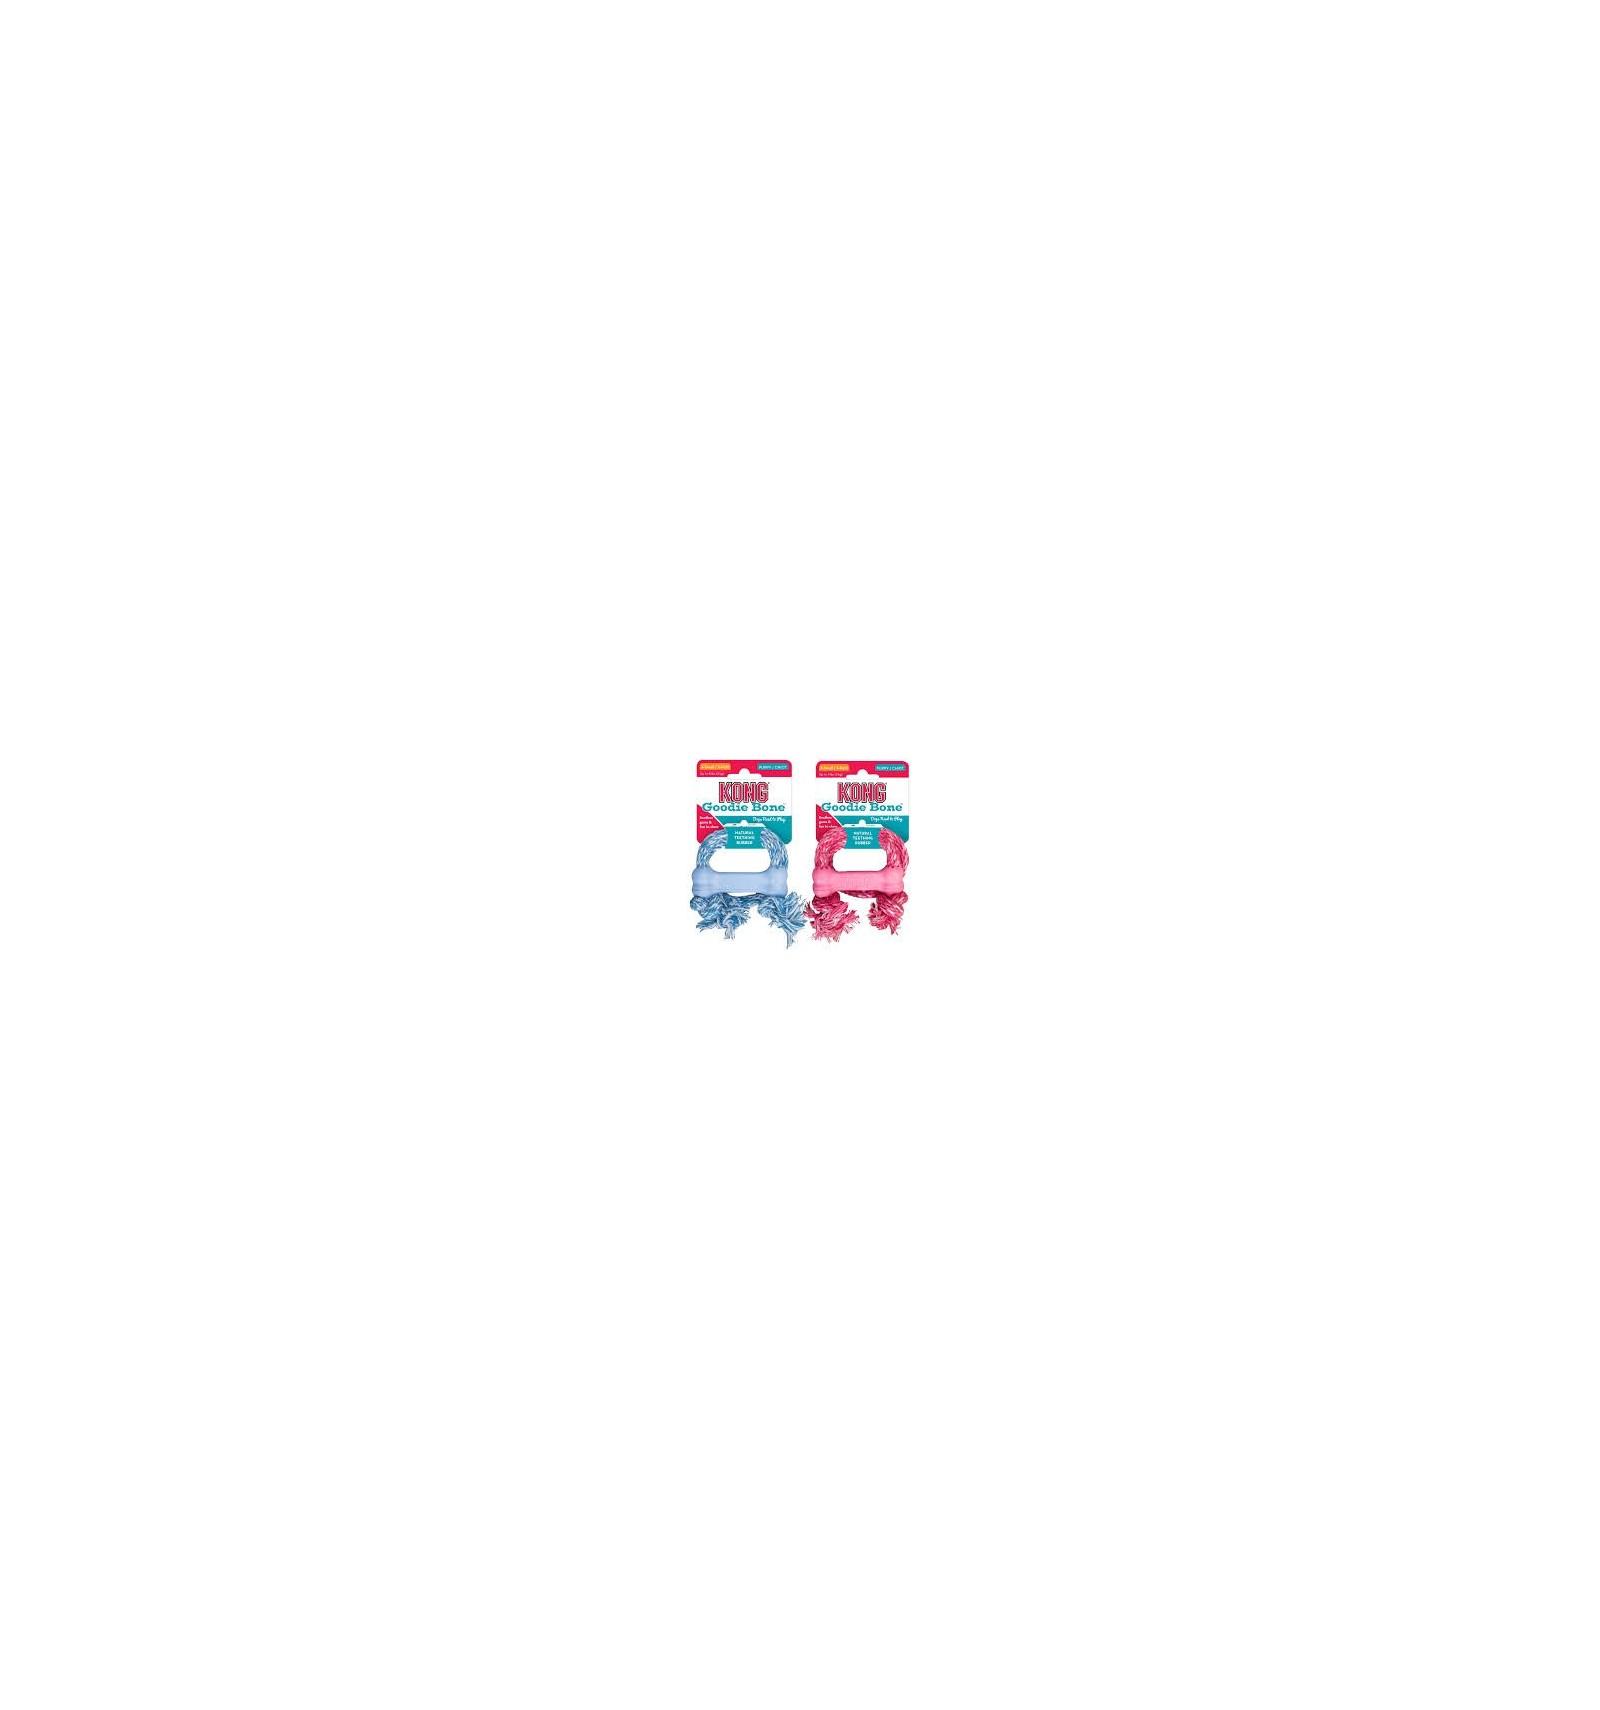 116ef46955e6 Brinquedo Kong Goodie Bone c/ Corda Tamanho - XS (8 cm)